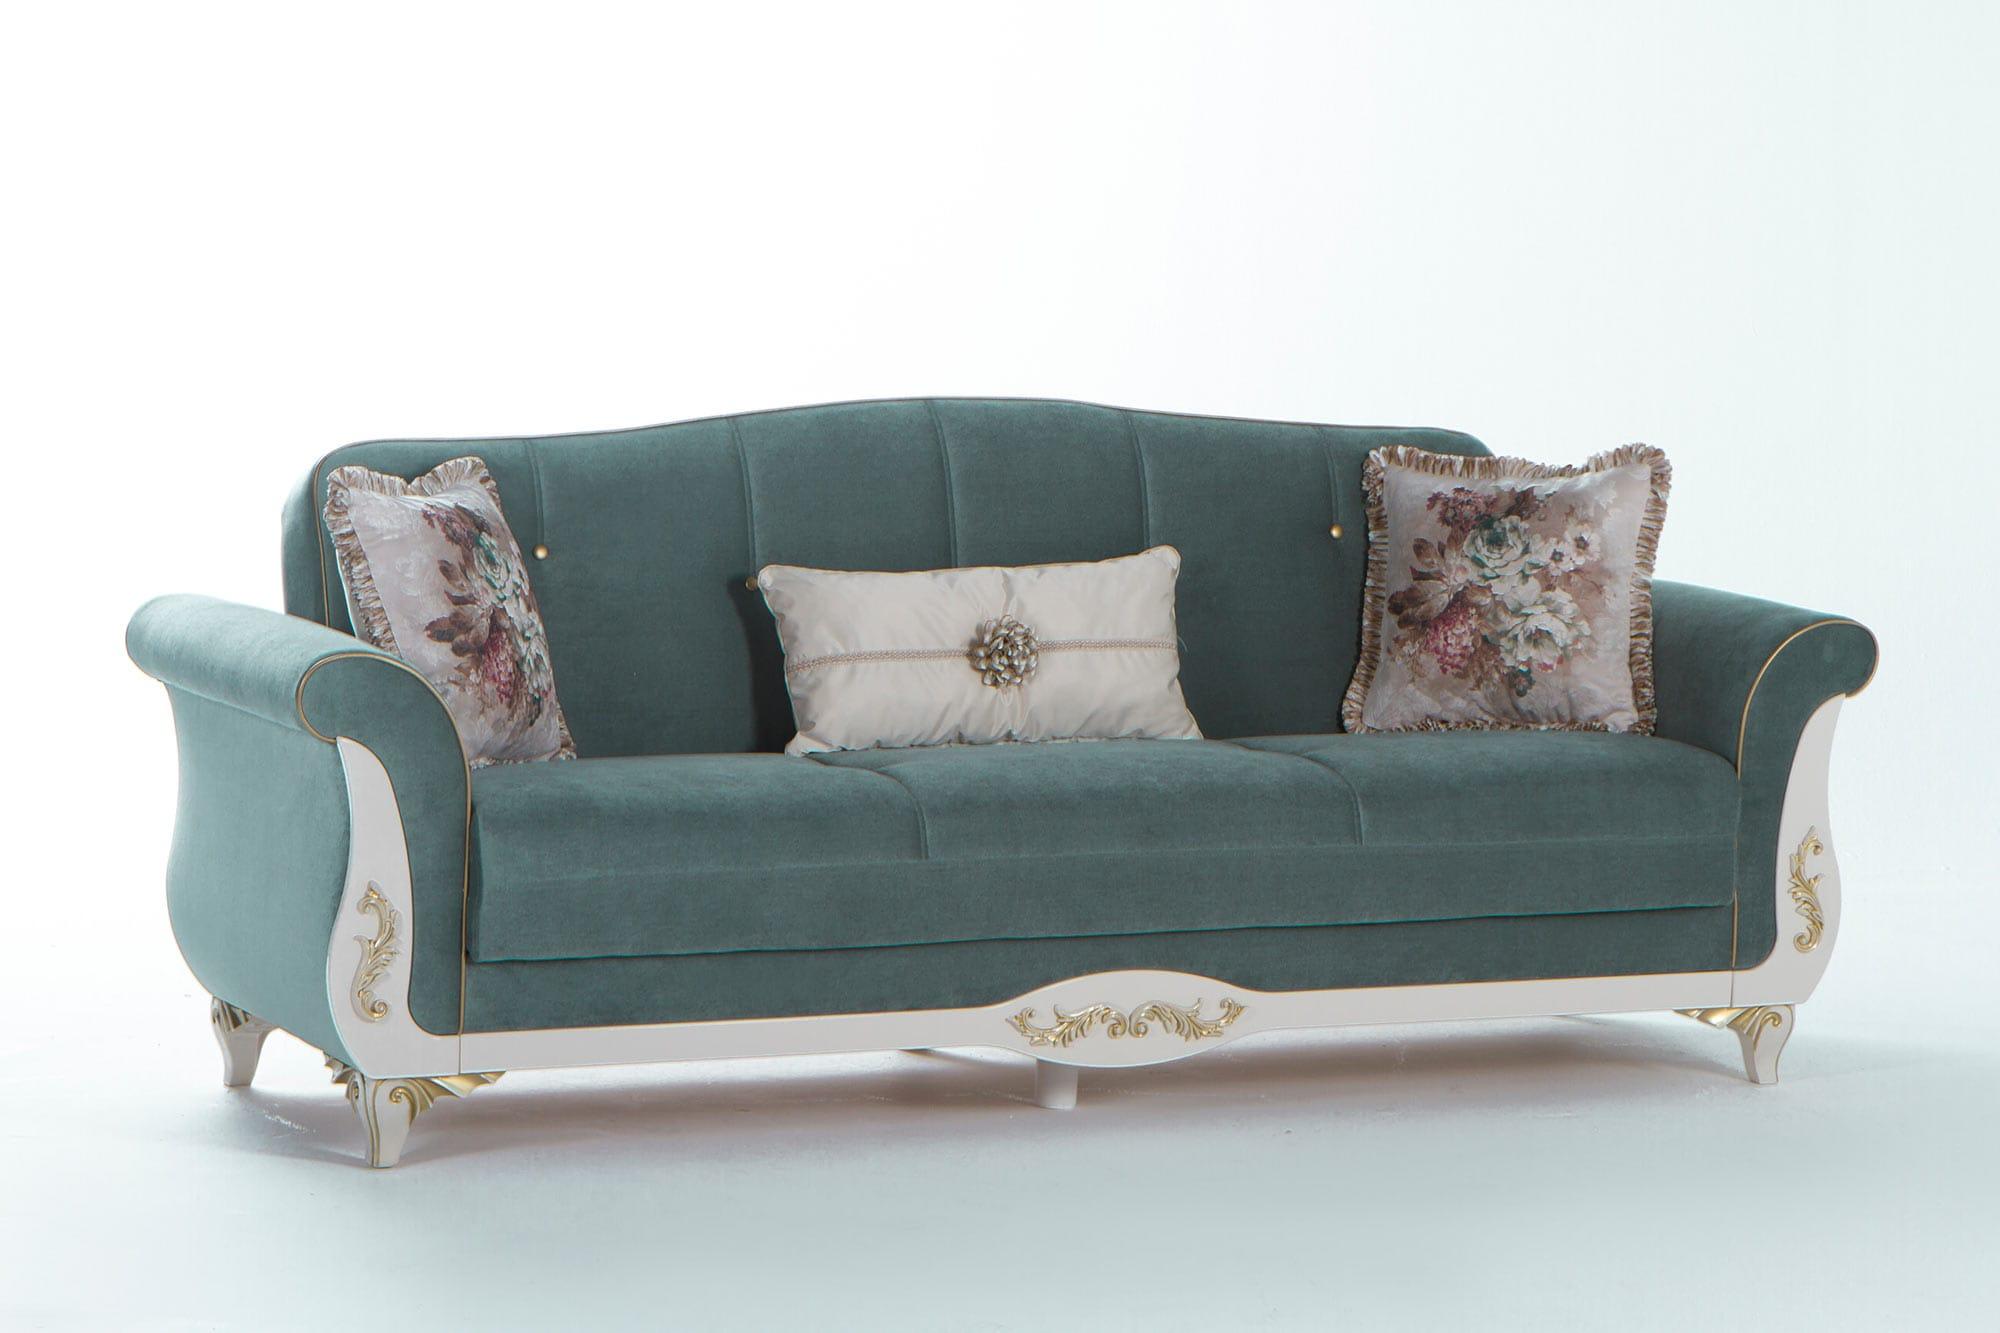 Astoria Caprice Seafoam Green Convertible Sofa Bed By